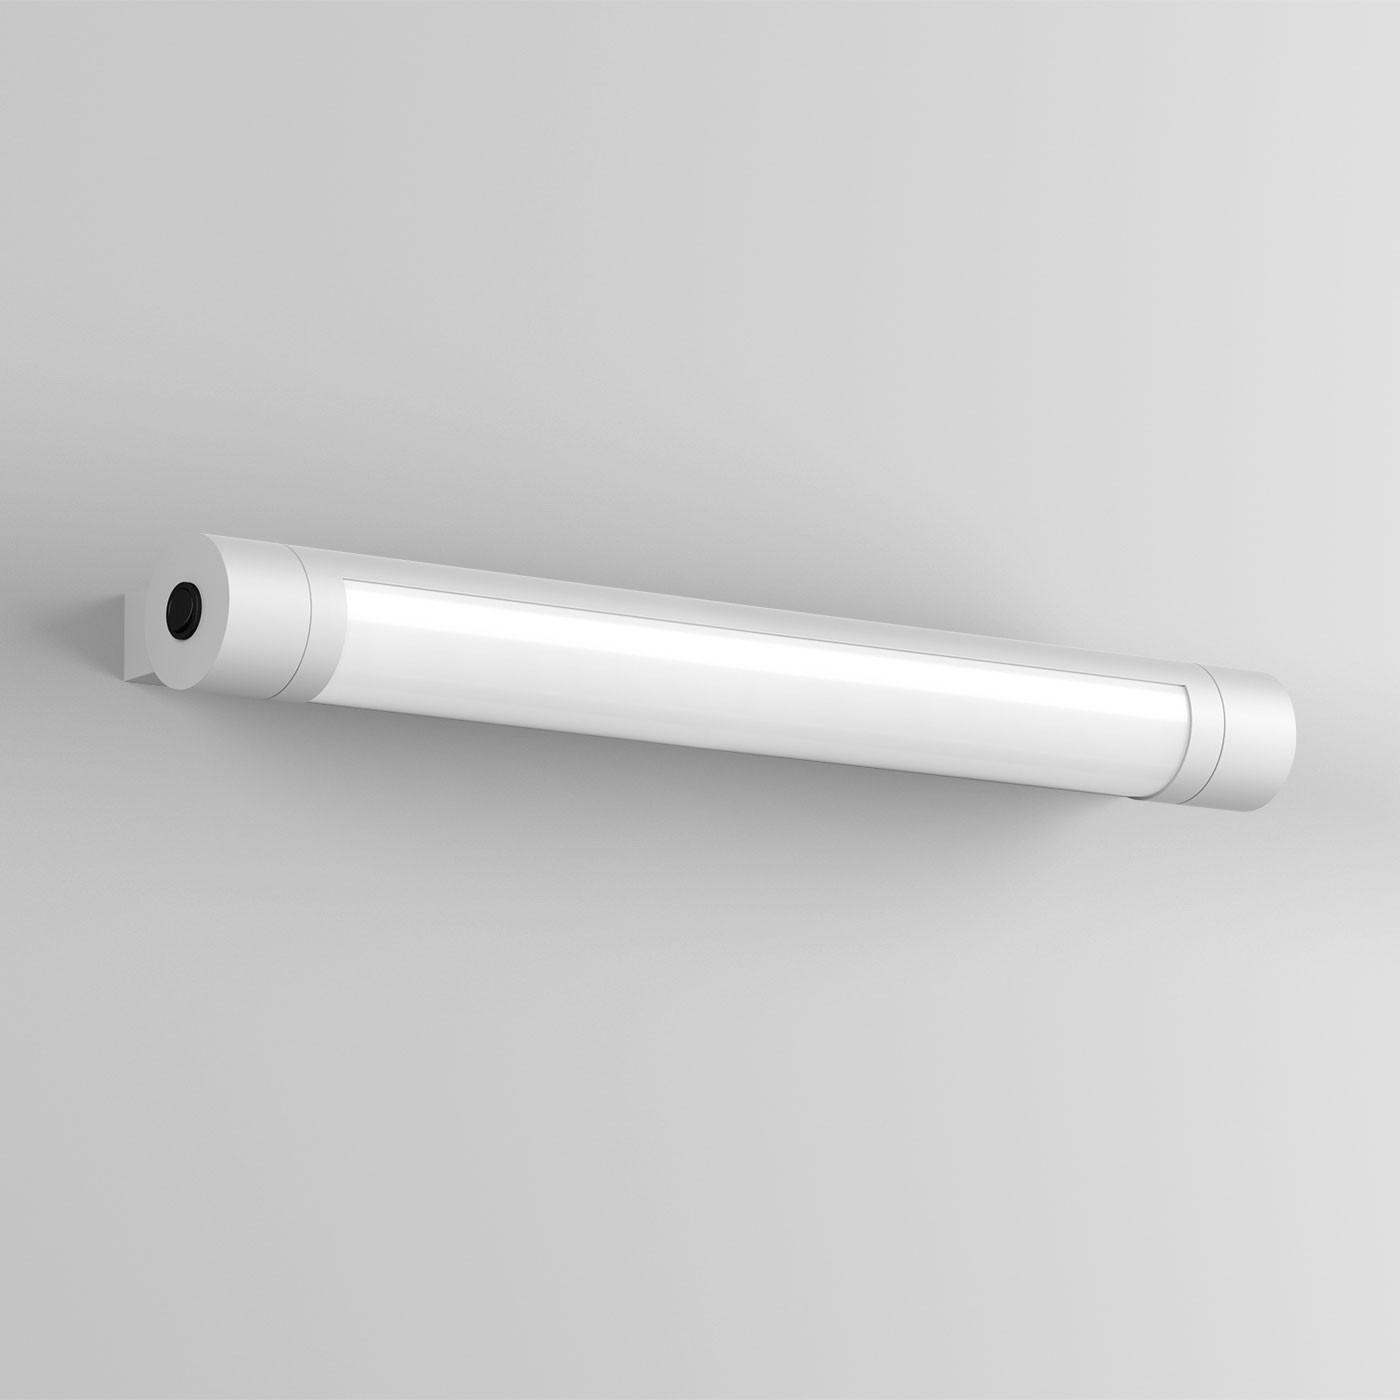 Bega Variata 2 Wandleuchte LED, 45 cm